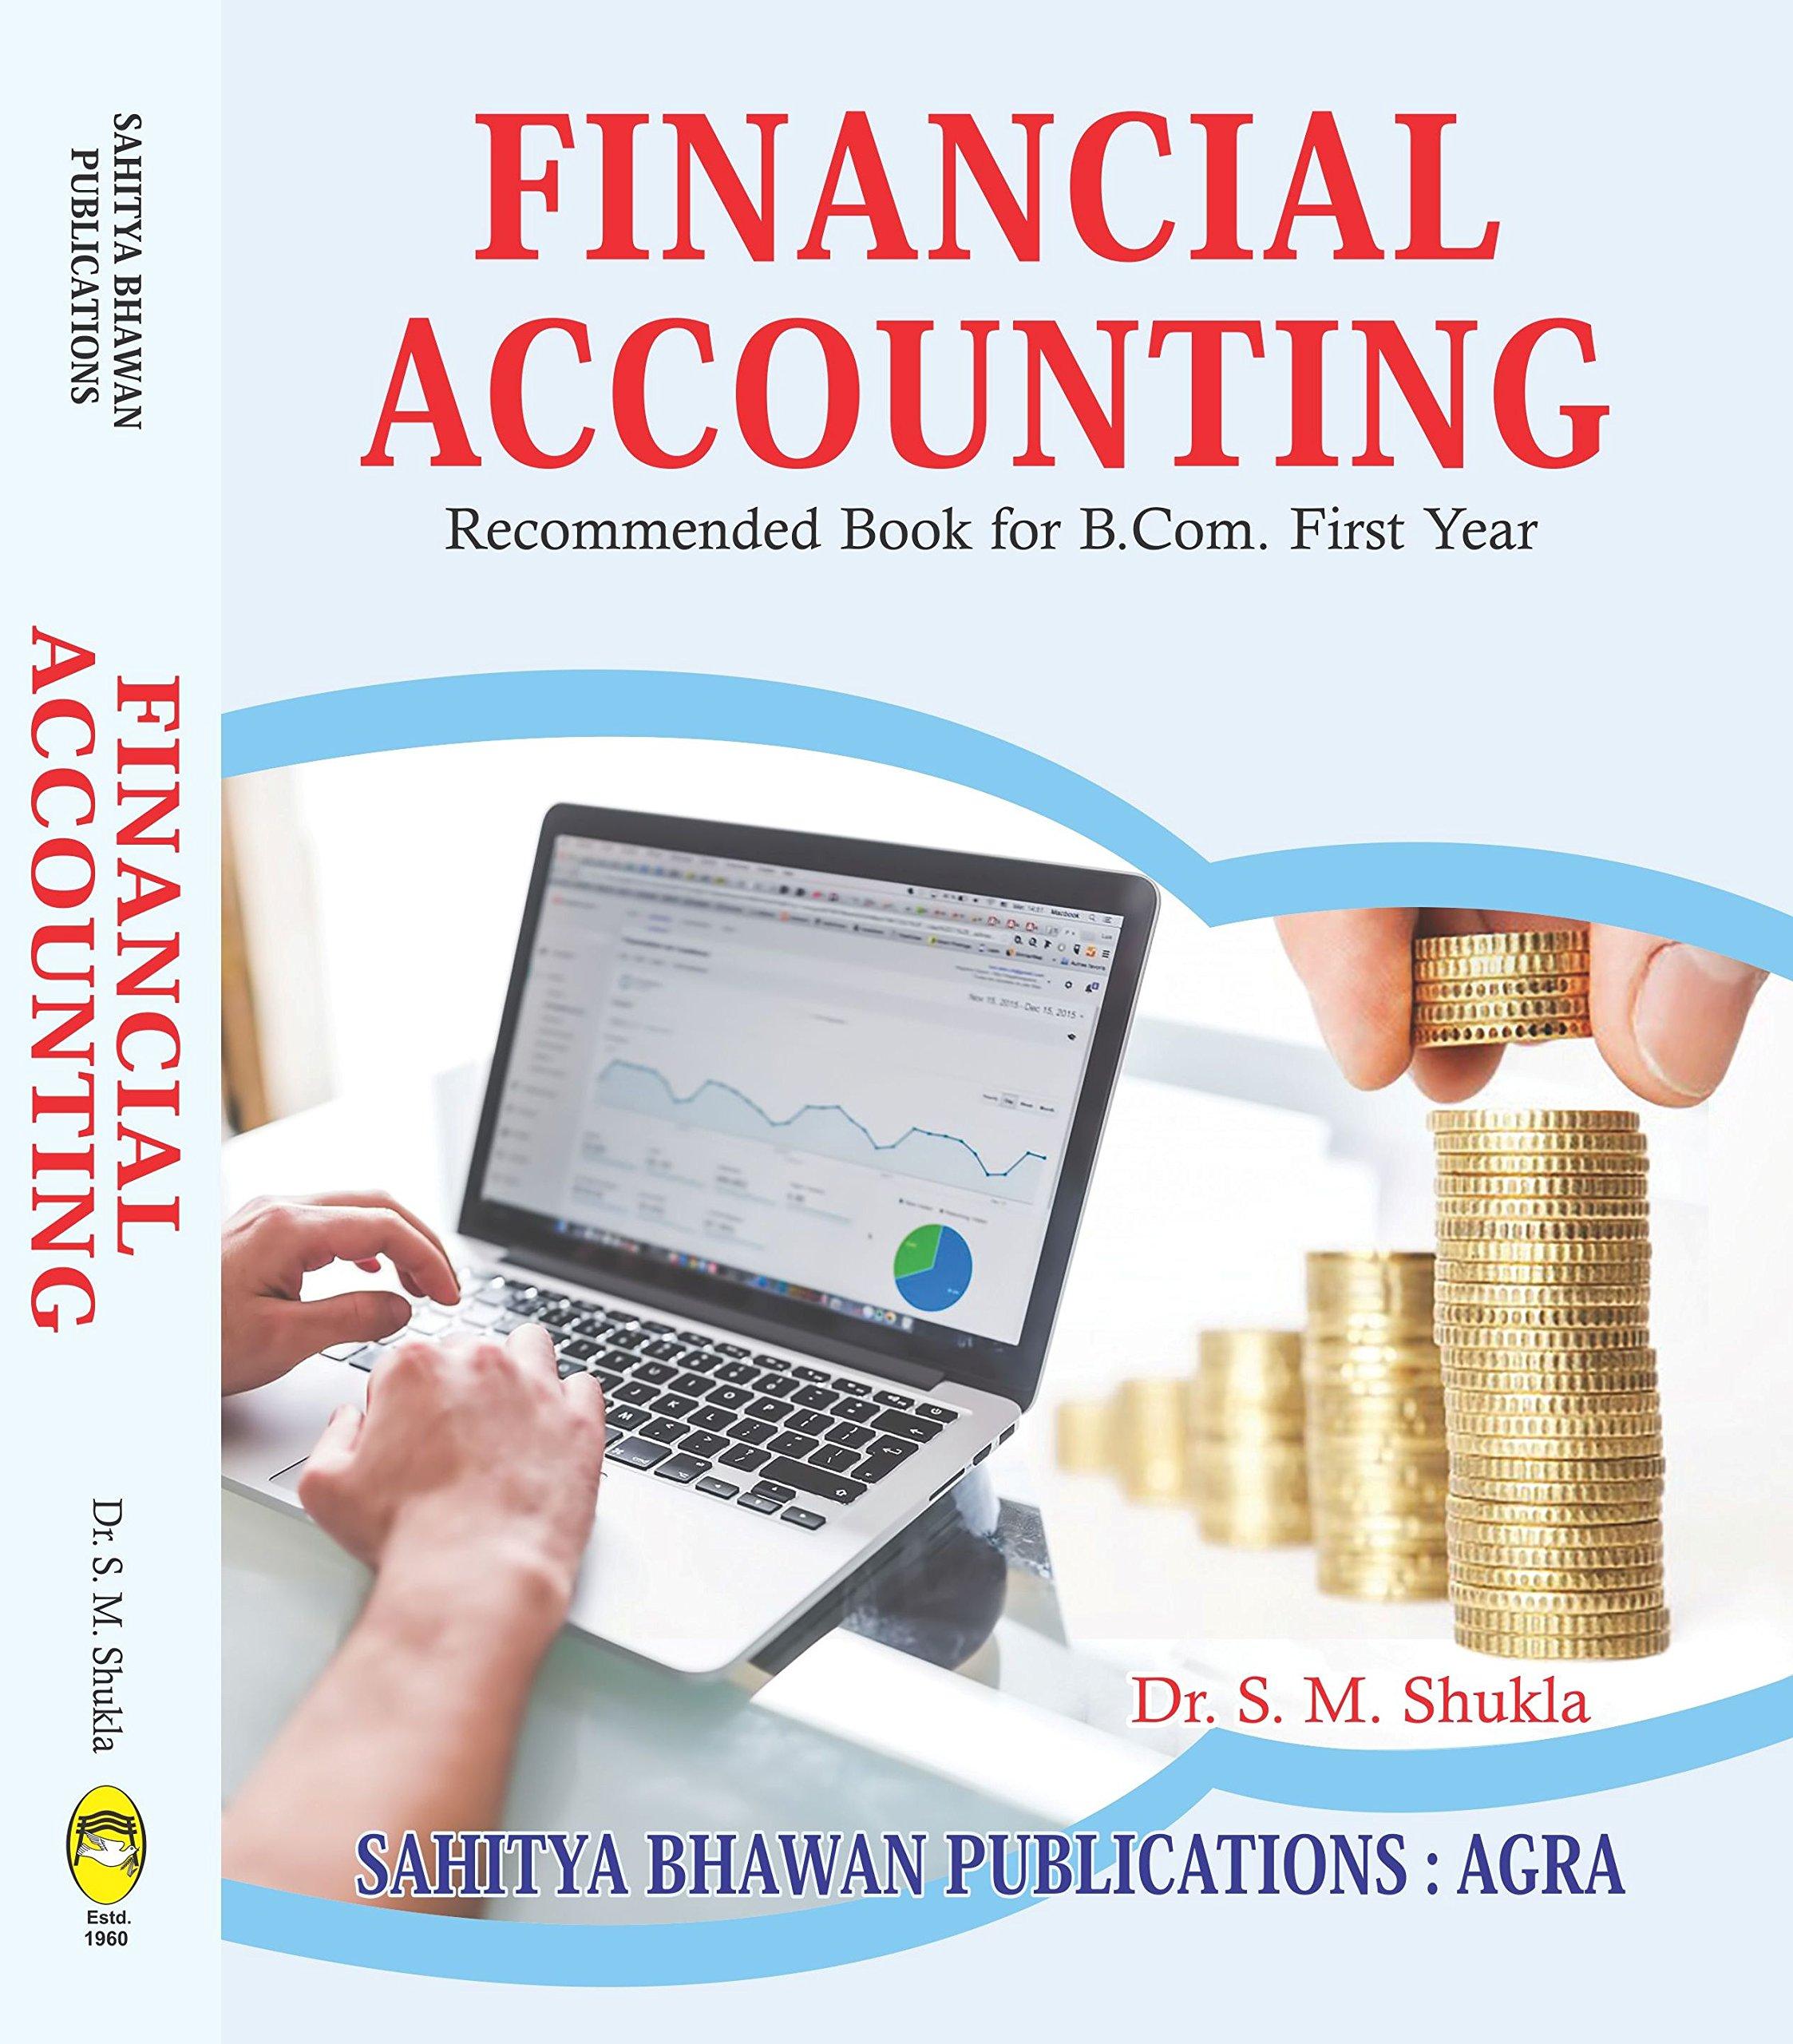 Financial accounting books 1st year pdf bcom